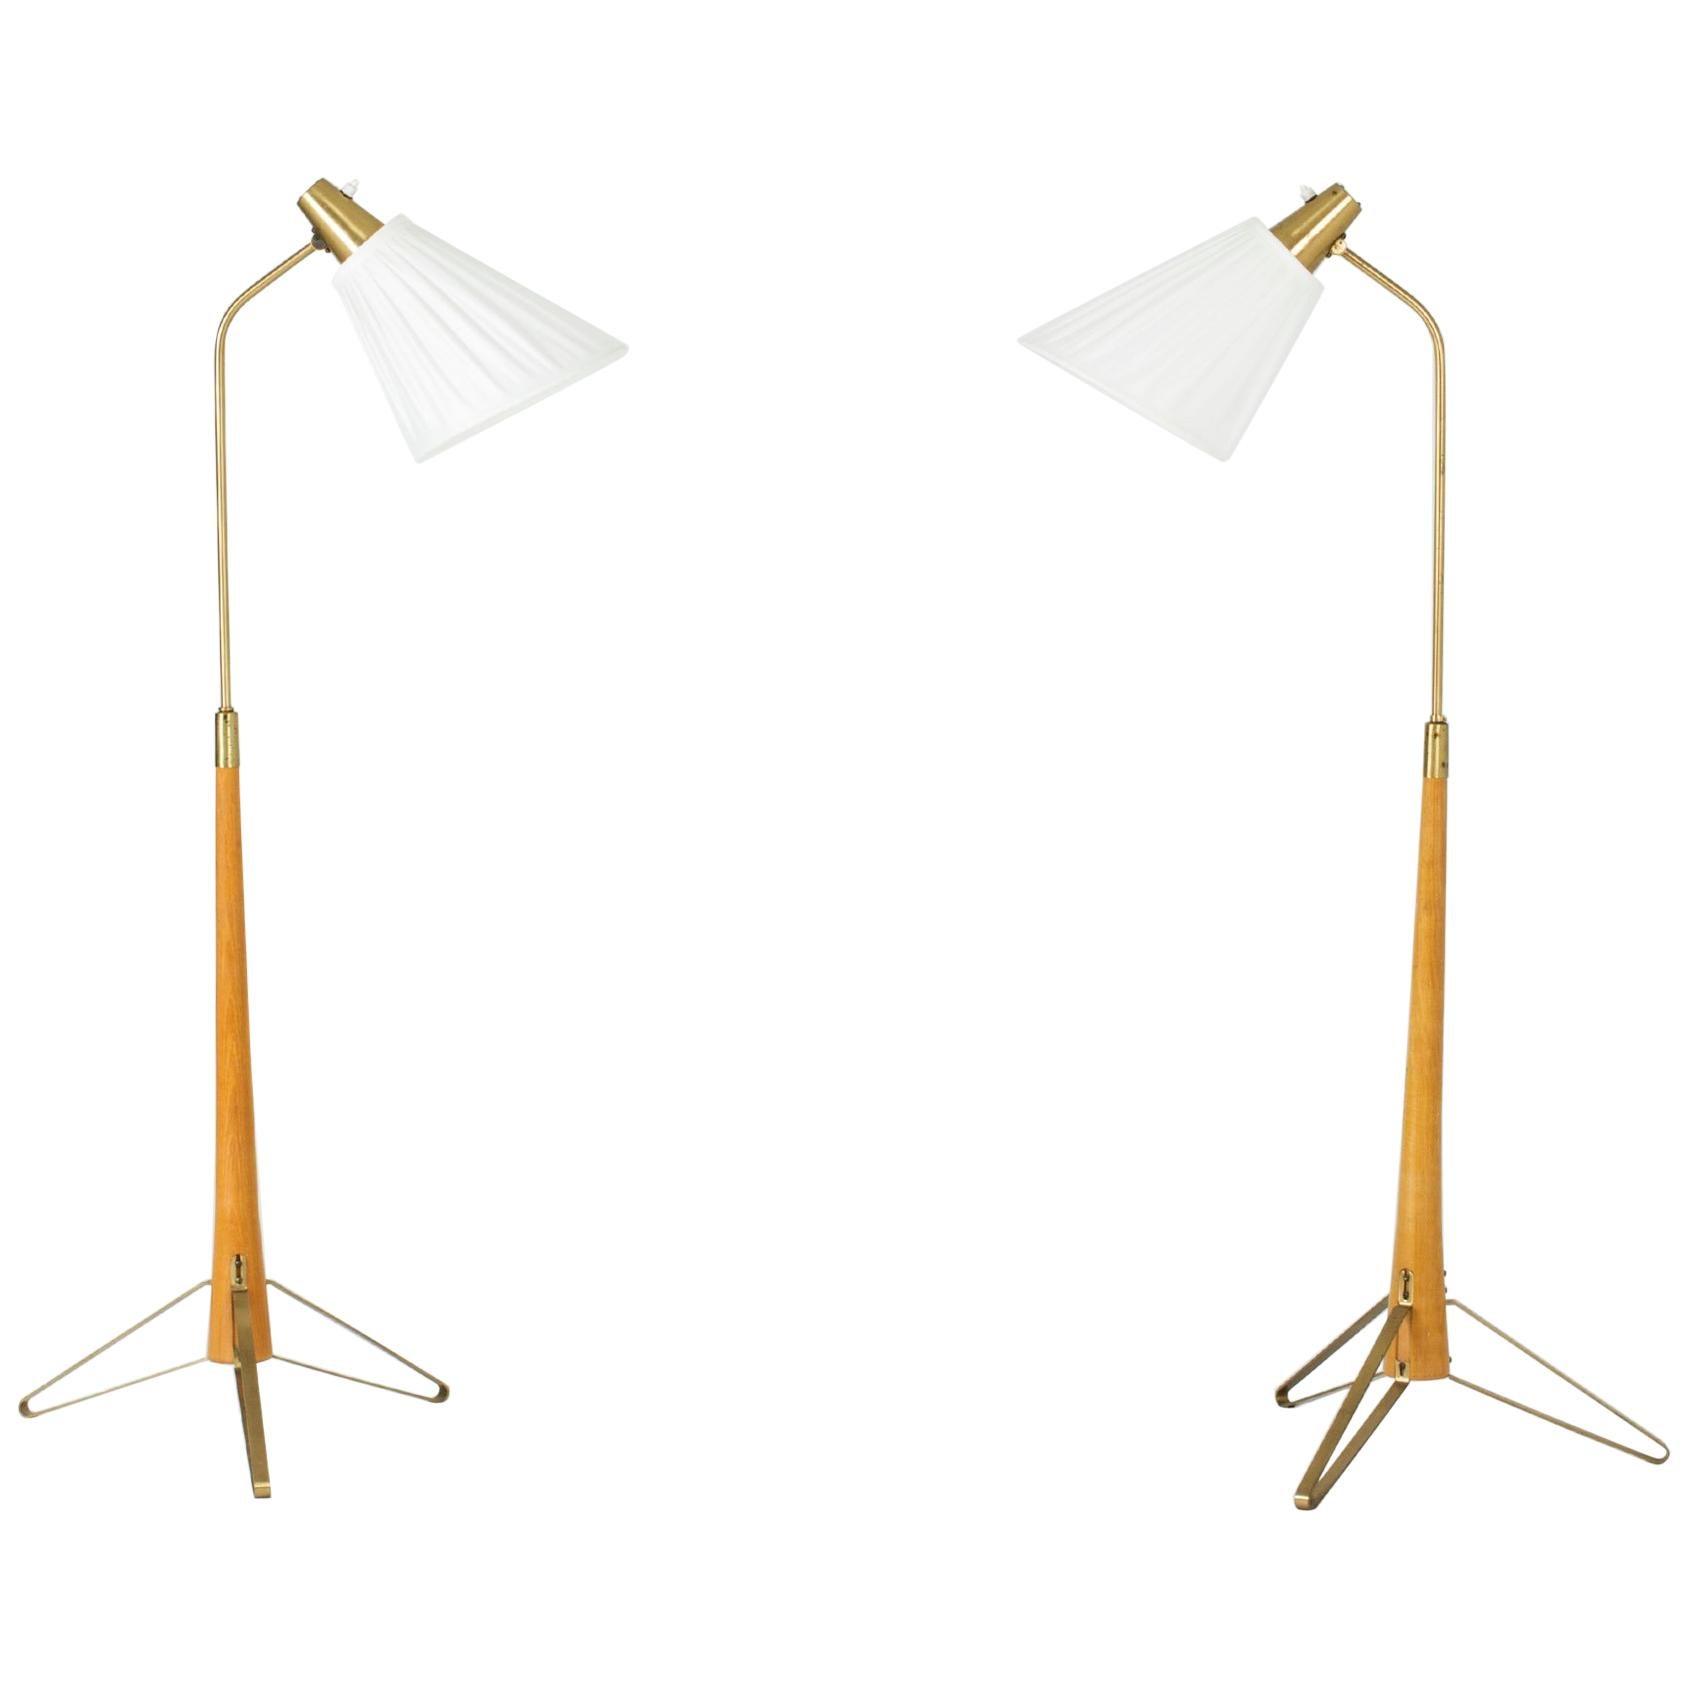 Pair of Brass and Beech Floor Lamps by Hans Bergström